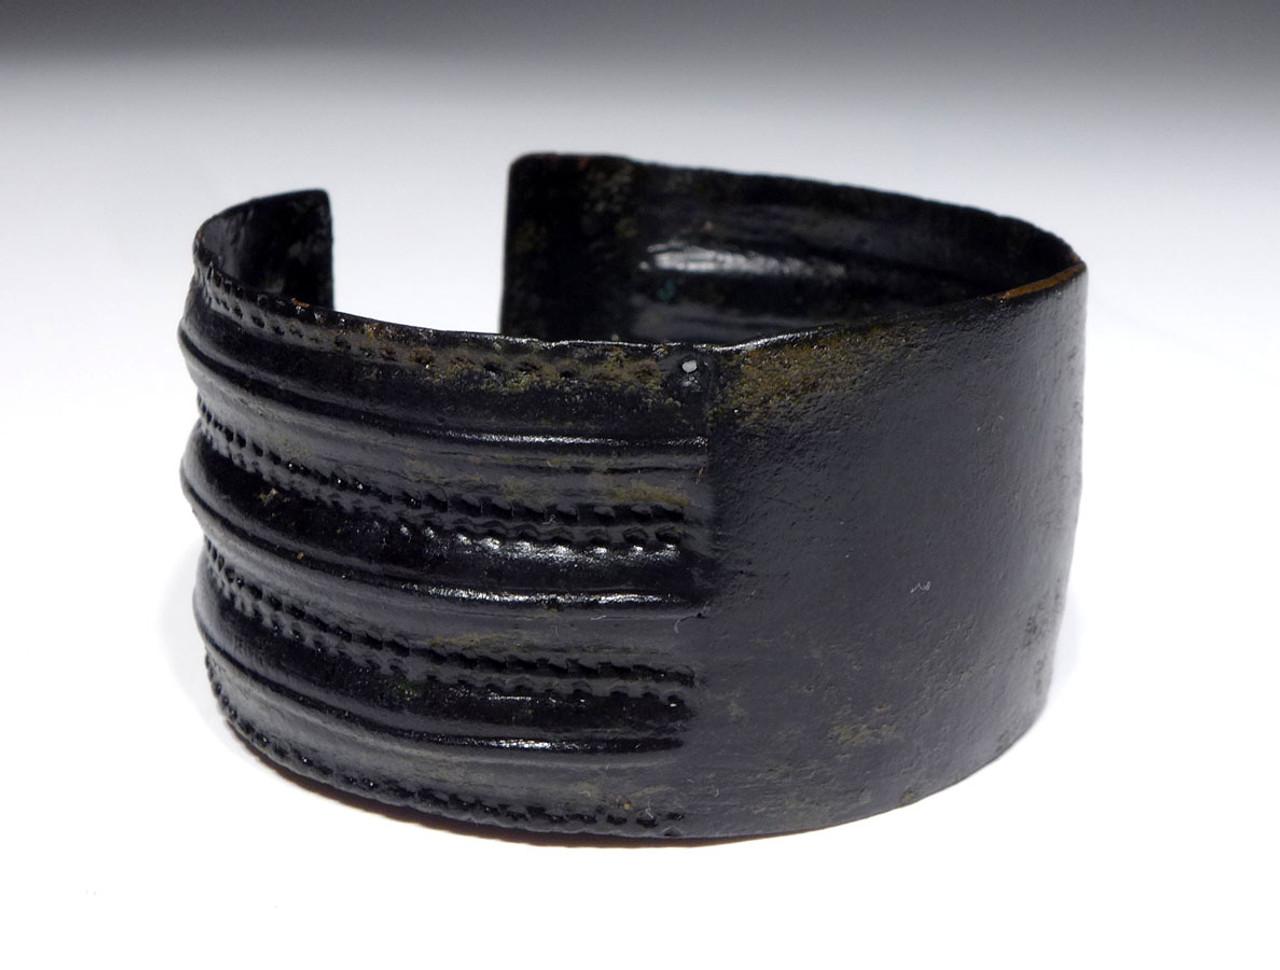 ANCIENT NEAR EASTERN HAMMERED DECORATIVE BRONZE BANGLE BRACELET *NE185